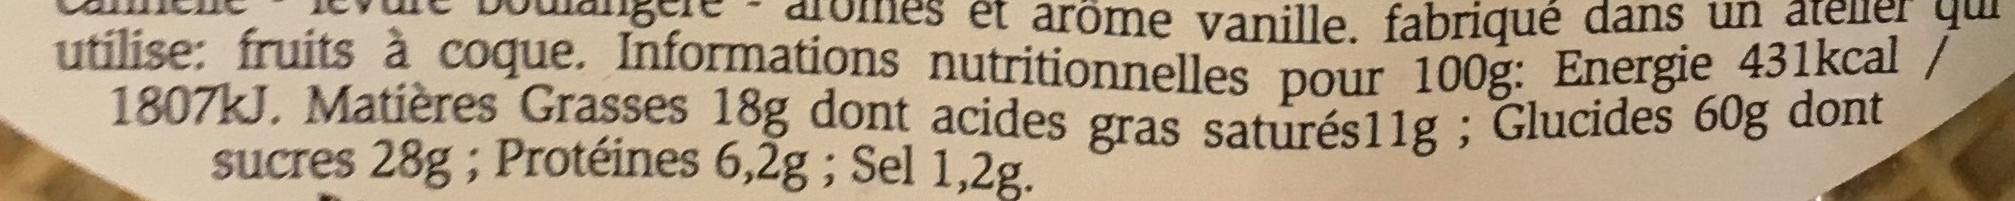 Gaufres fourrées chocolat - Voedingswaarden - fr